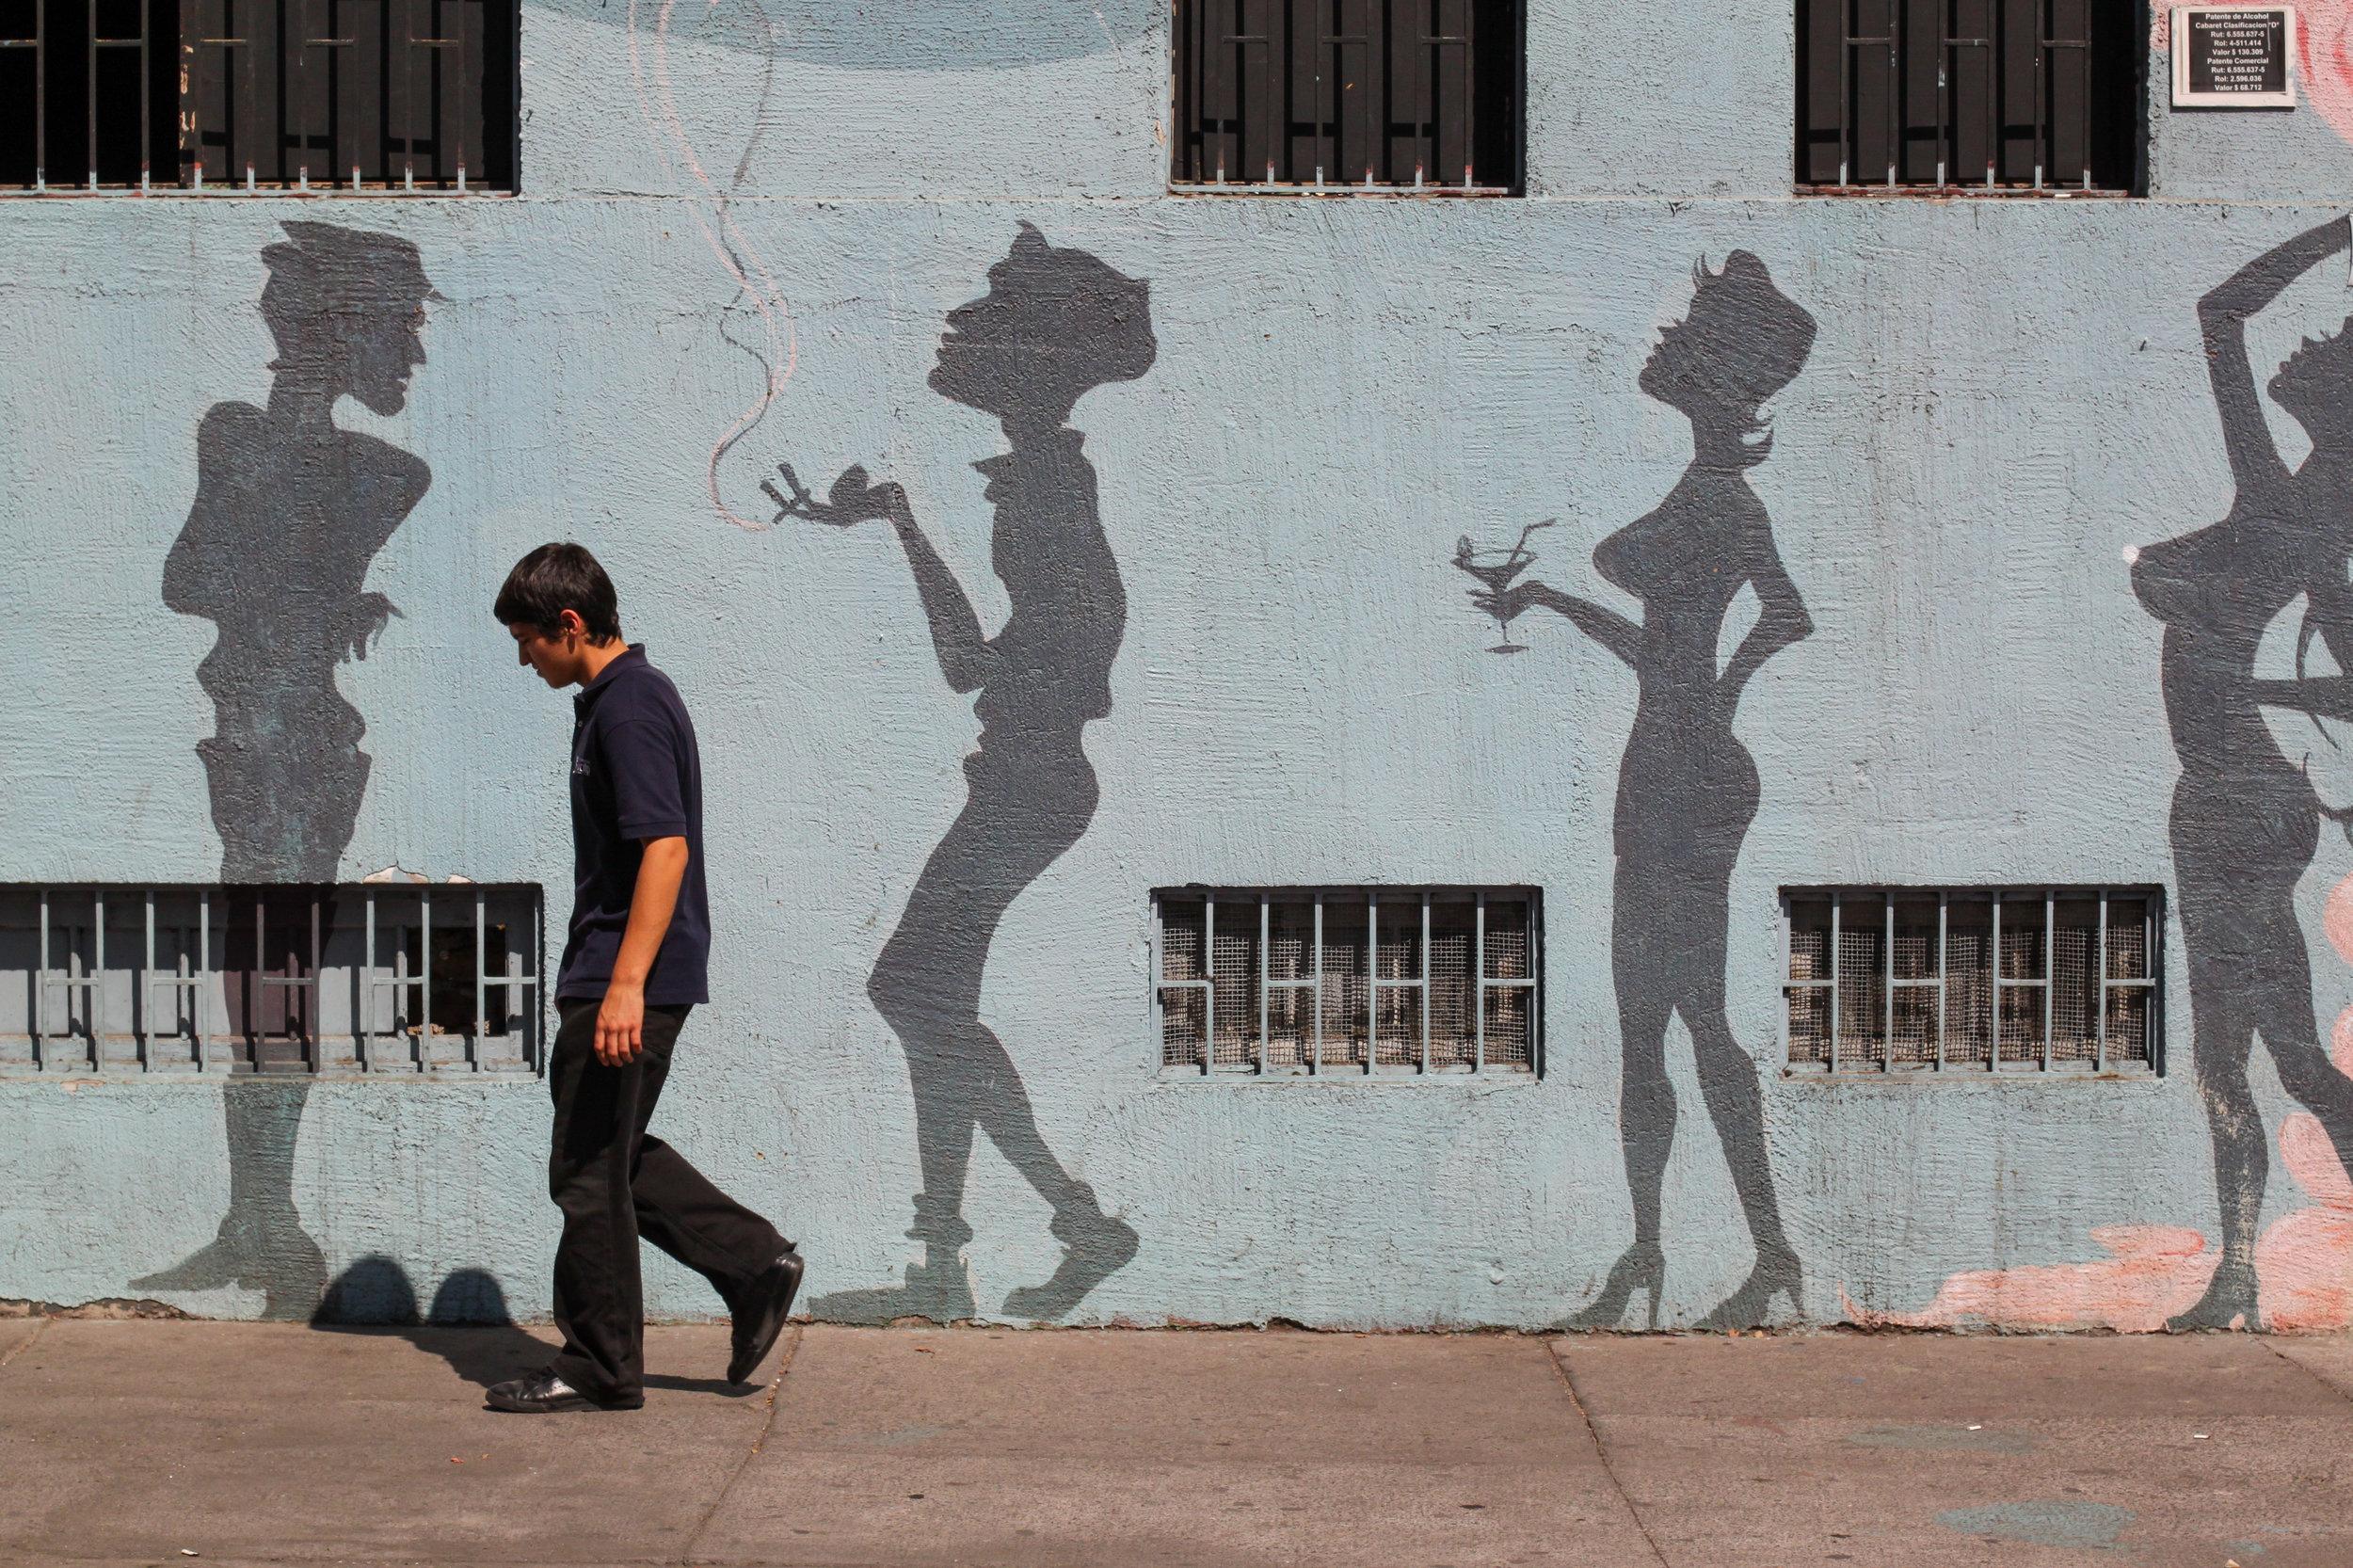 streets_satiago.jpg